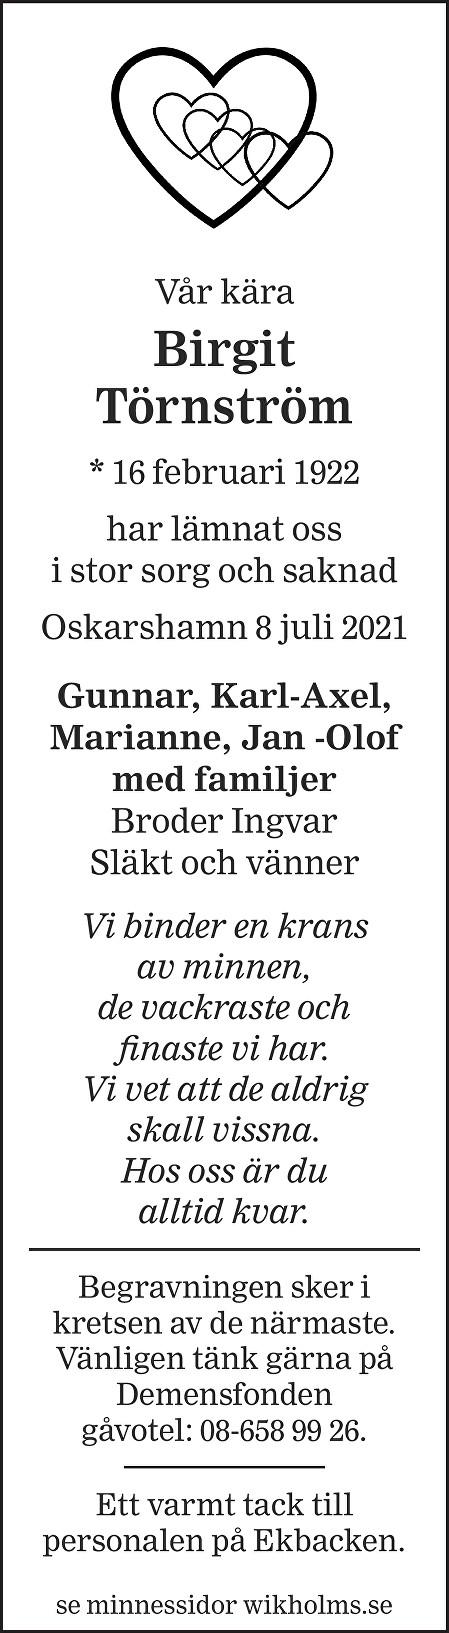 Birgit Törnström Death notice